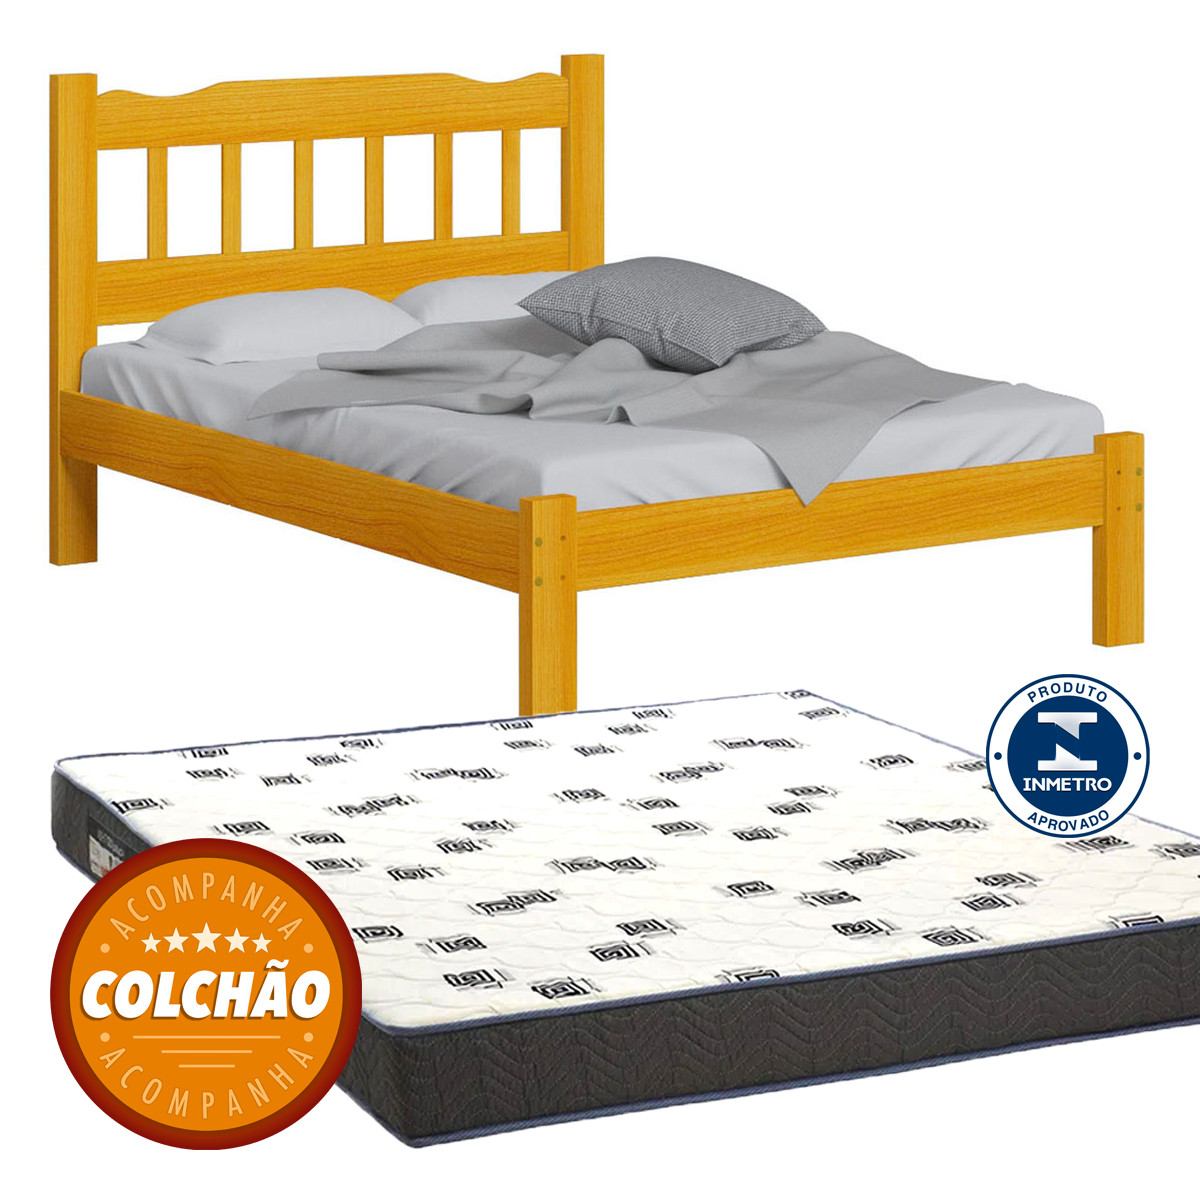 Cama Casal Perola Cor Cerejeira + Colchao